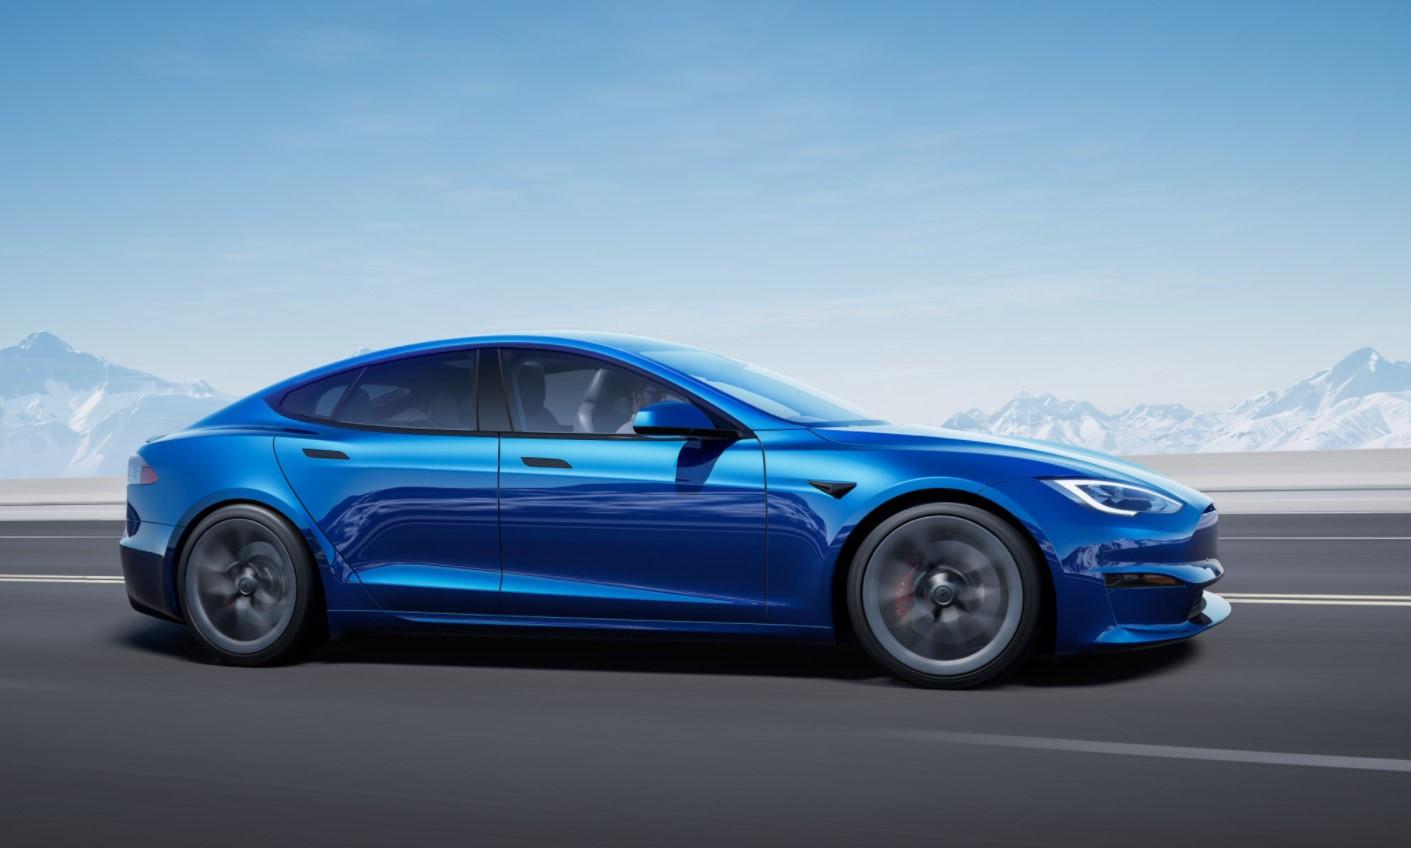 Tesla Model S Plaid Blue